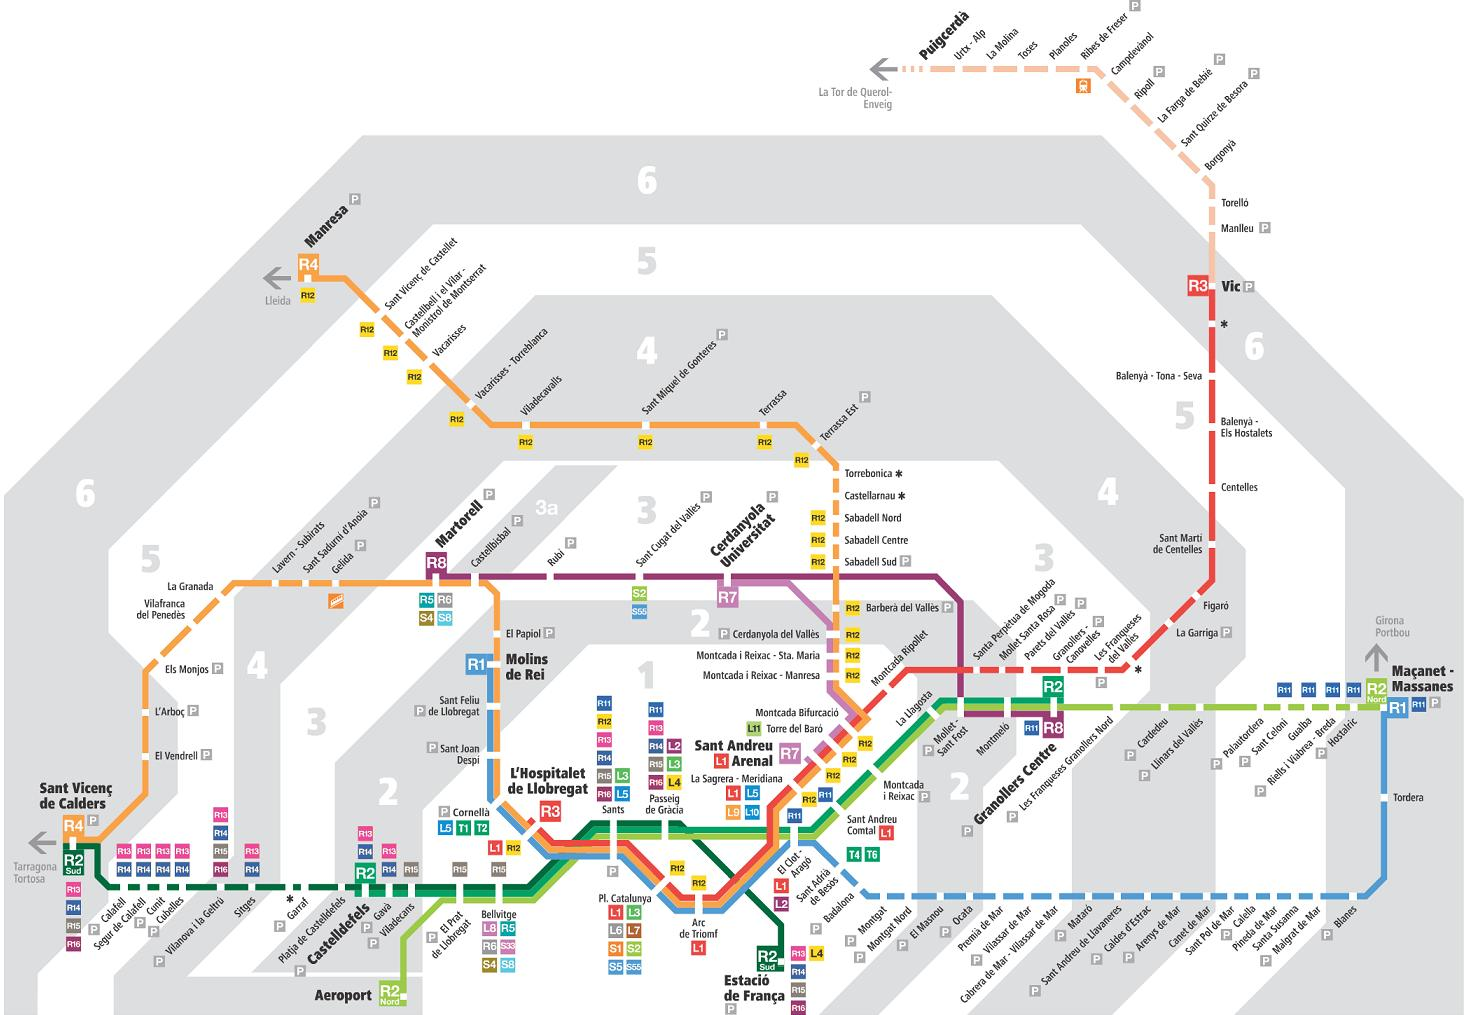 Mapa Transporte Publico Barcelona.Barcelona Mapa De Transporte Publico Barcelona Mapa De